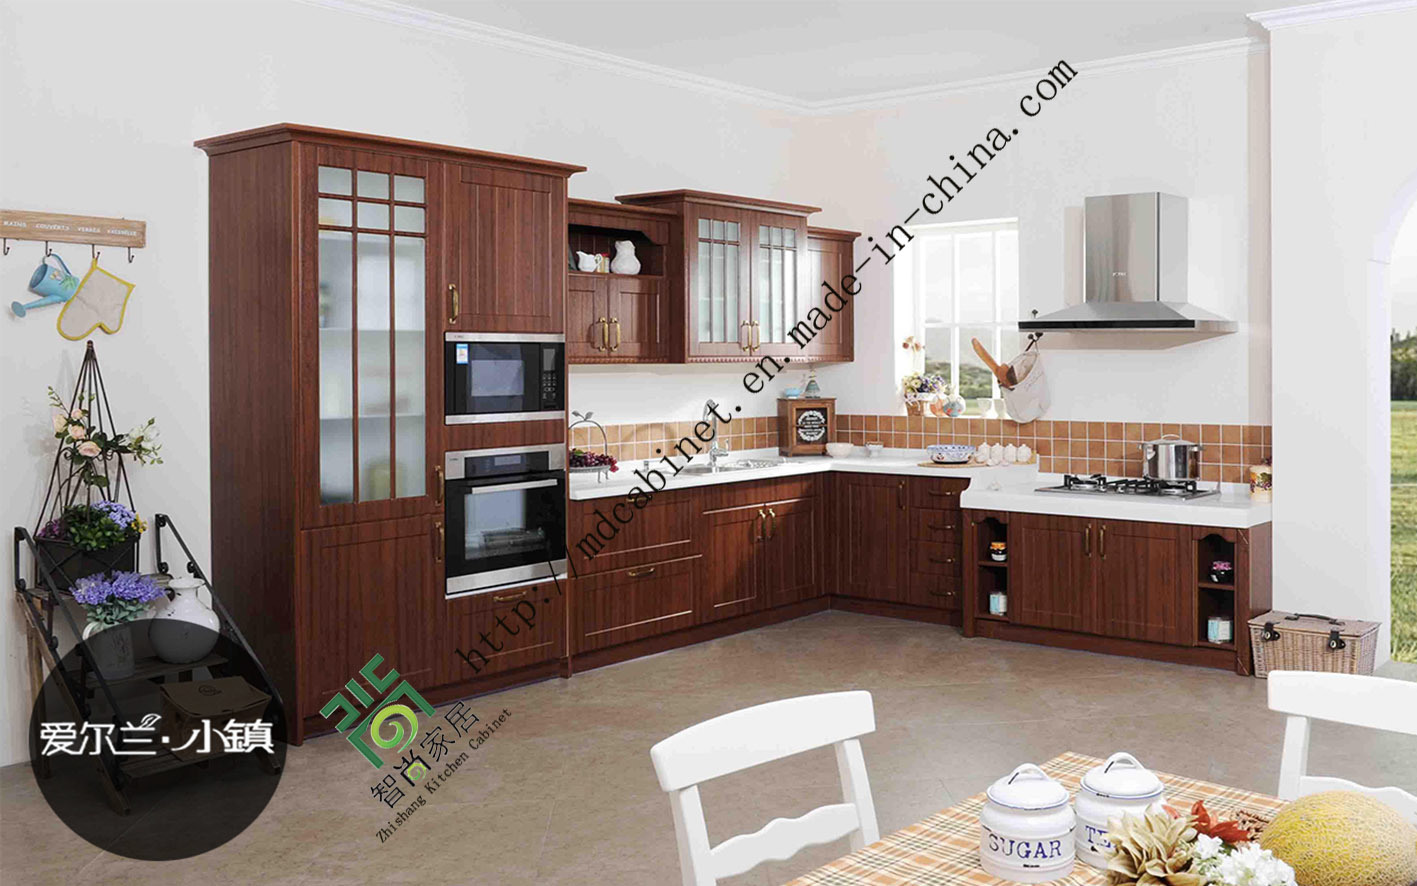 Foto de 2015 de pvc modernos gabinetes de cocina con Diseno de gabinetes de cocina modernos